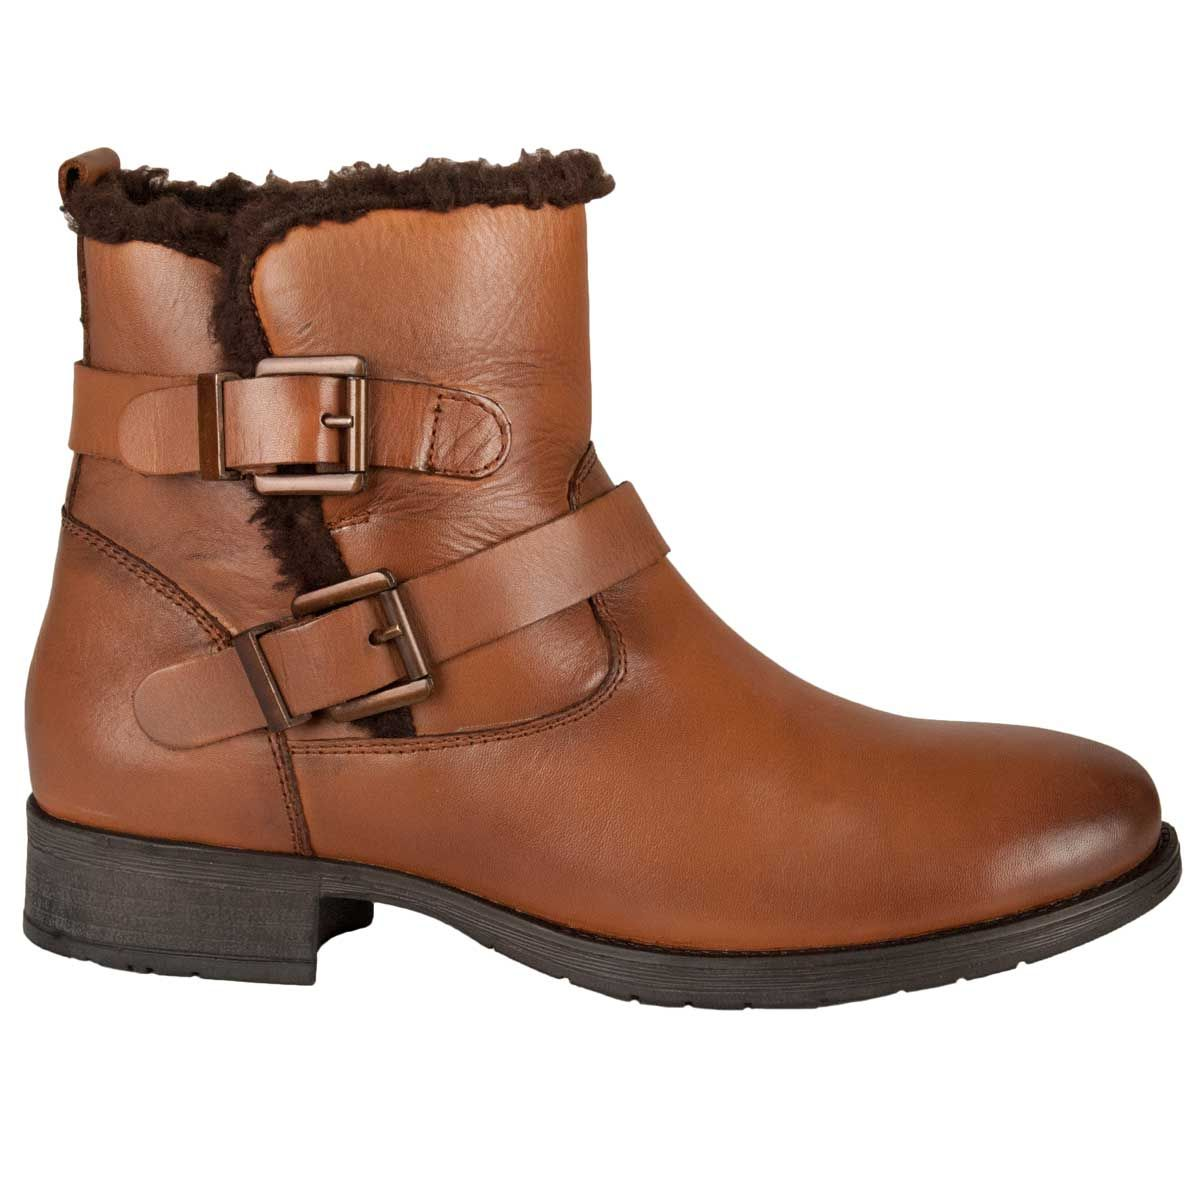 Purapiel Buckle Ankle Boot in Camel